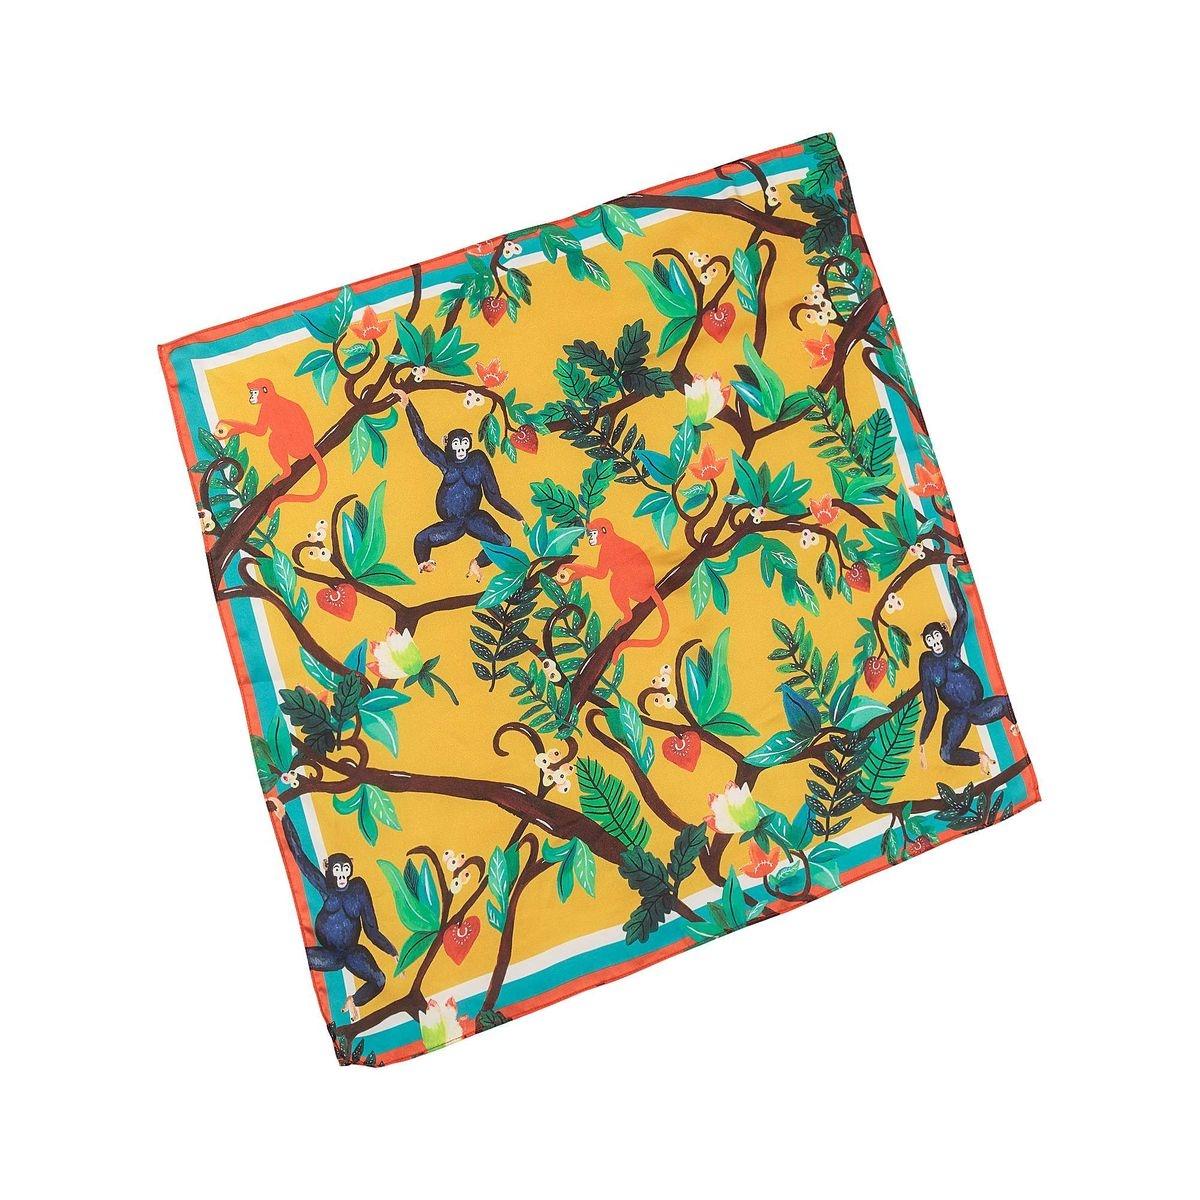 Foulard carré imprimé singe